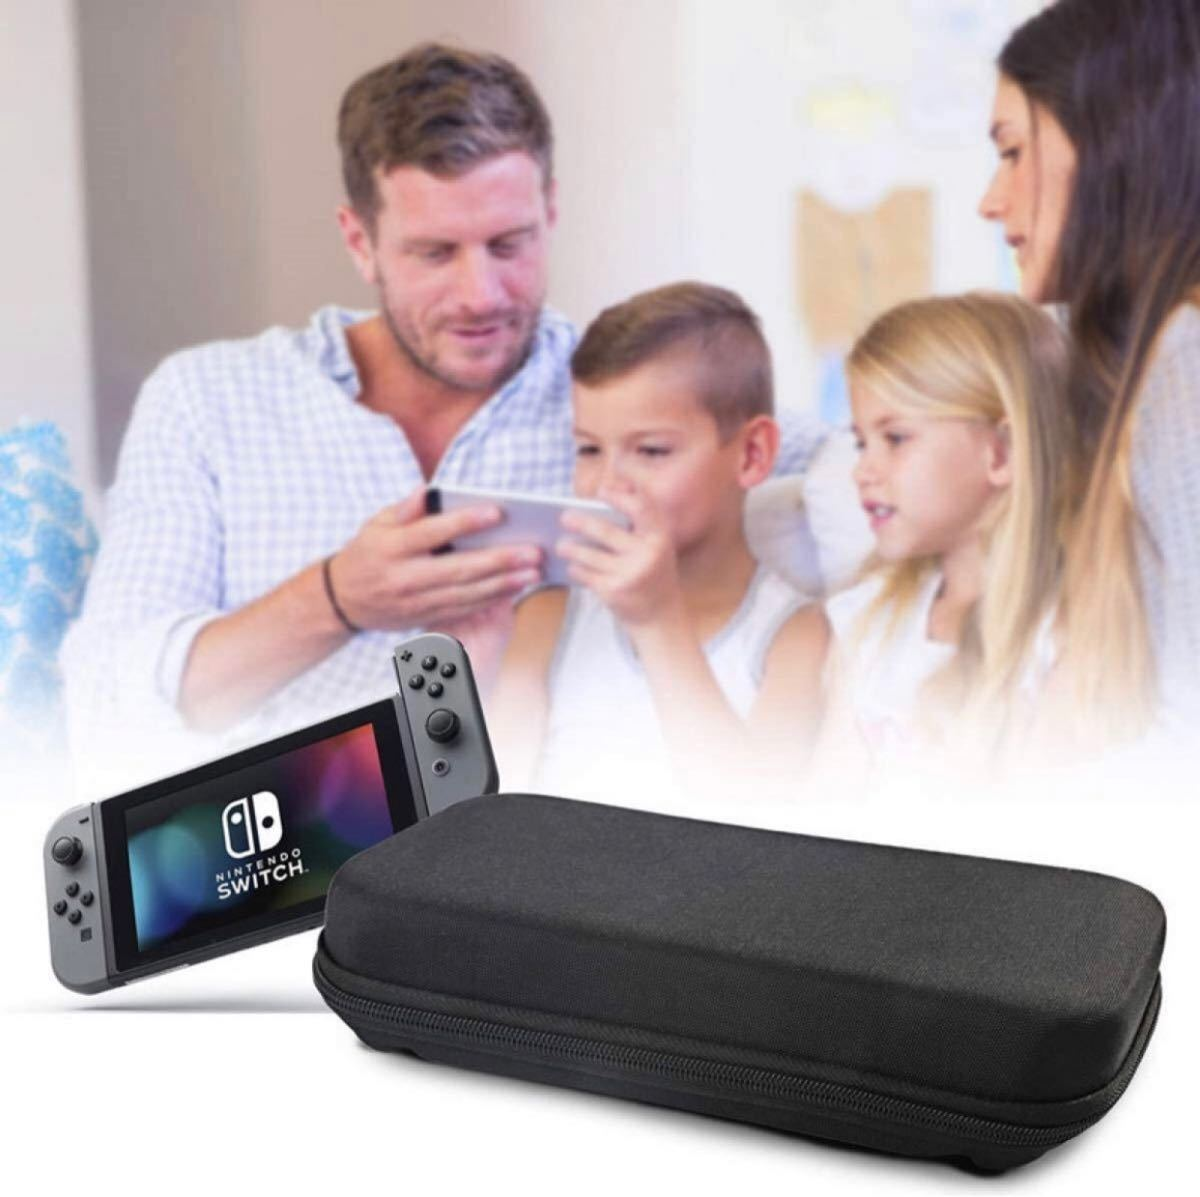 Nintendo Switch 任天堂スイッチ ニンテンドースイッチ 任天堂 ケース カバー